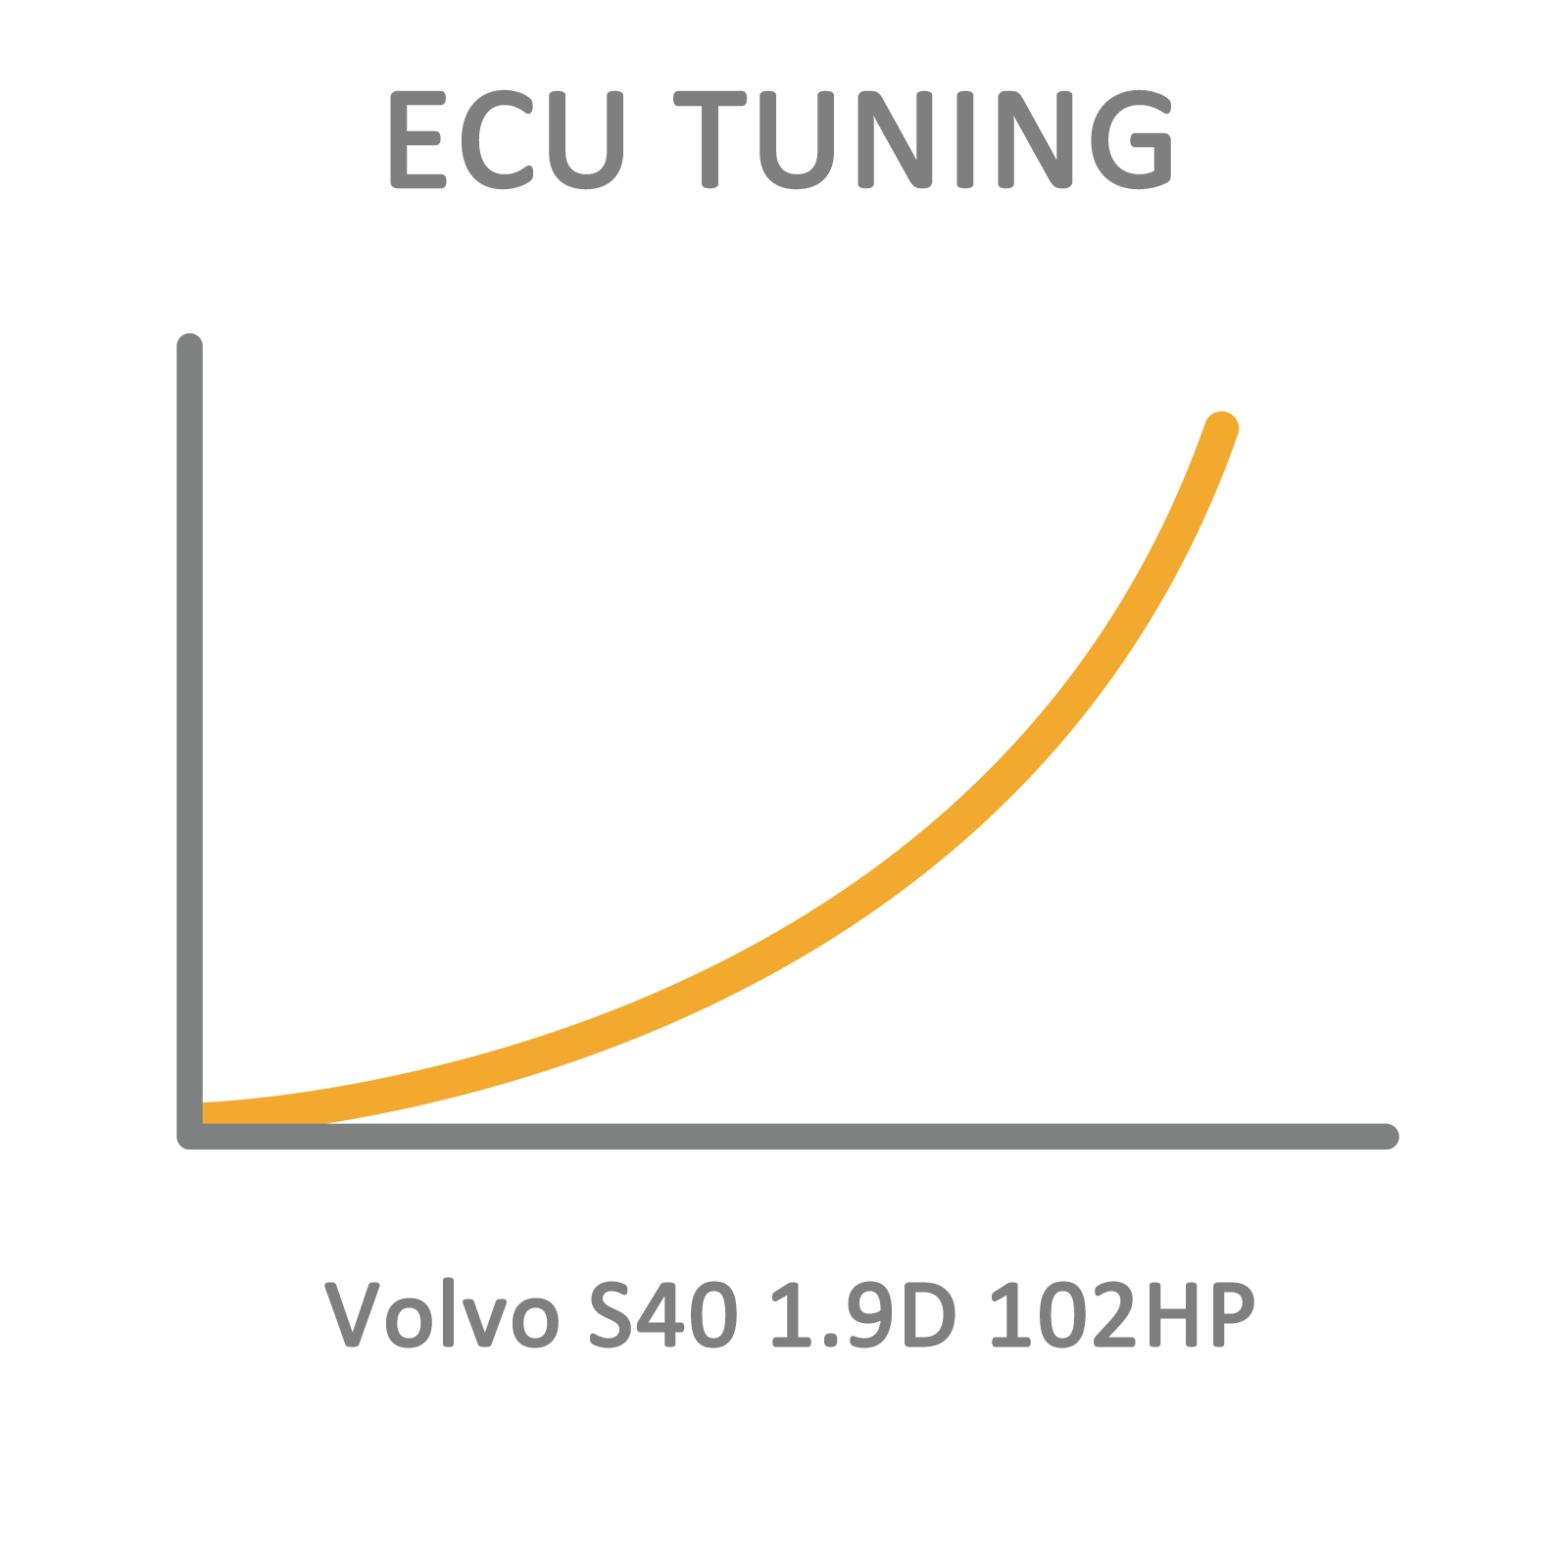 Volvo S40 1.9D 102HP ECU Tuning Remapping Programming